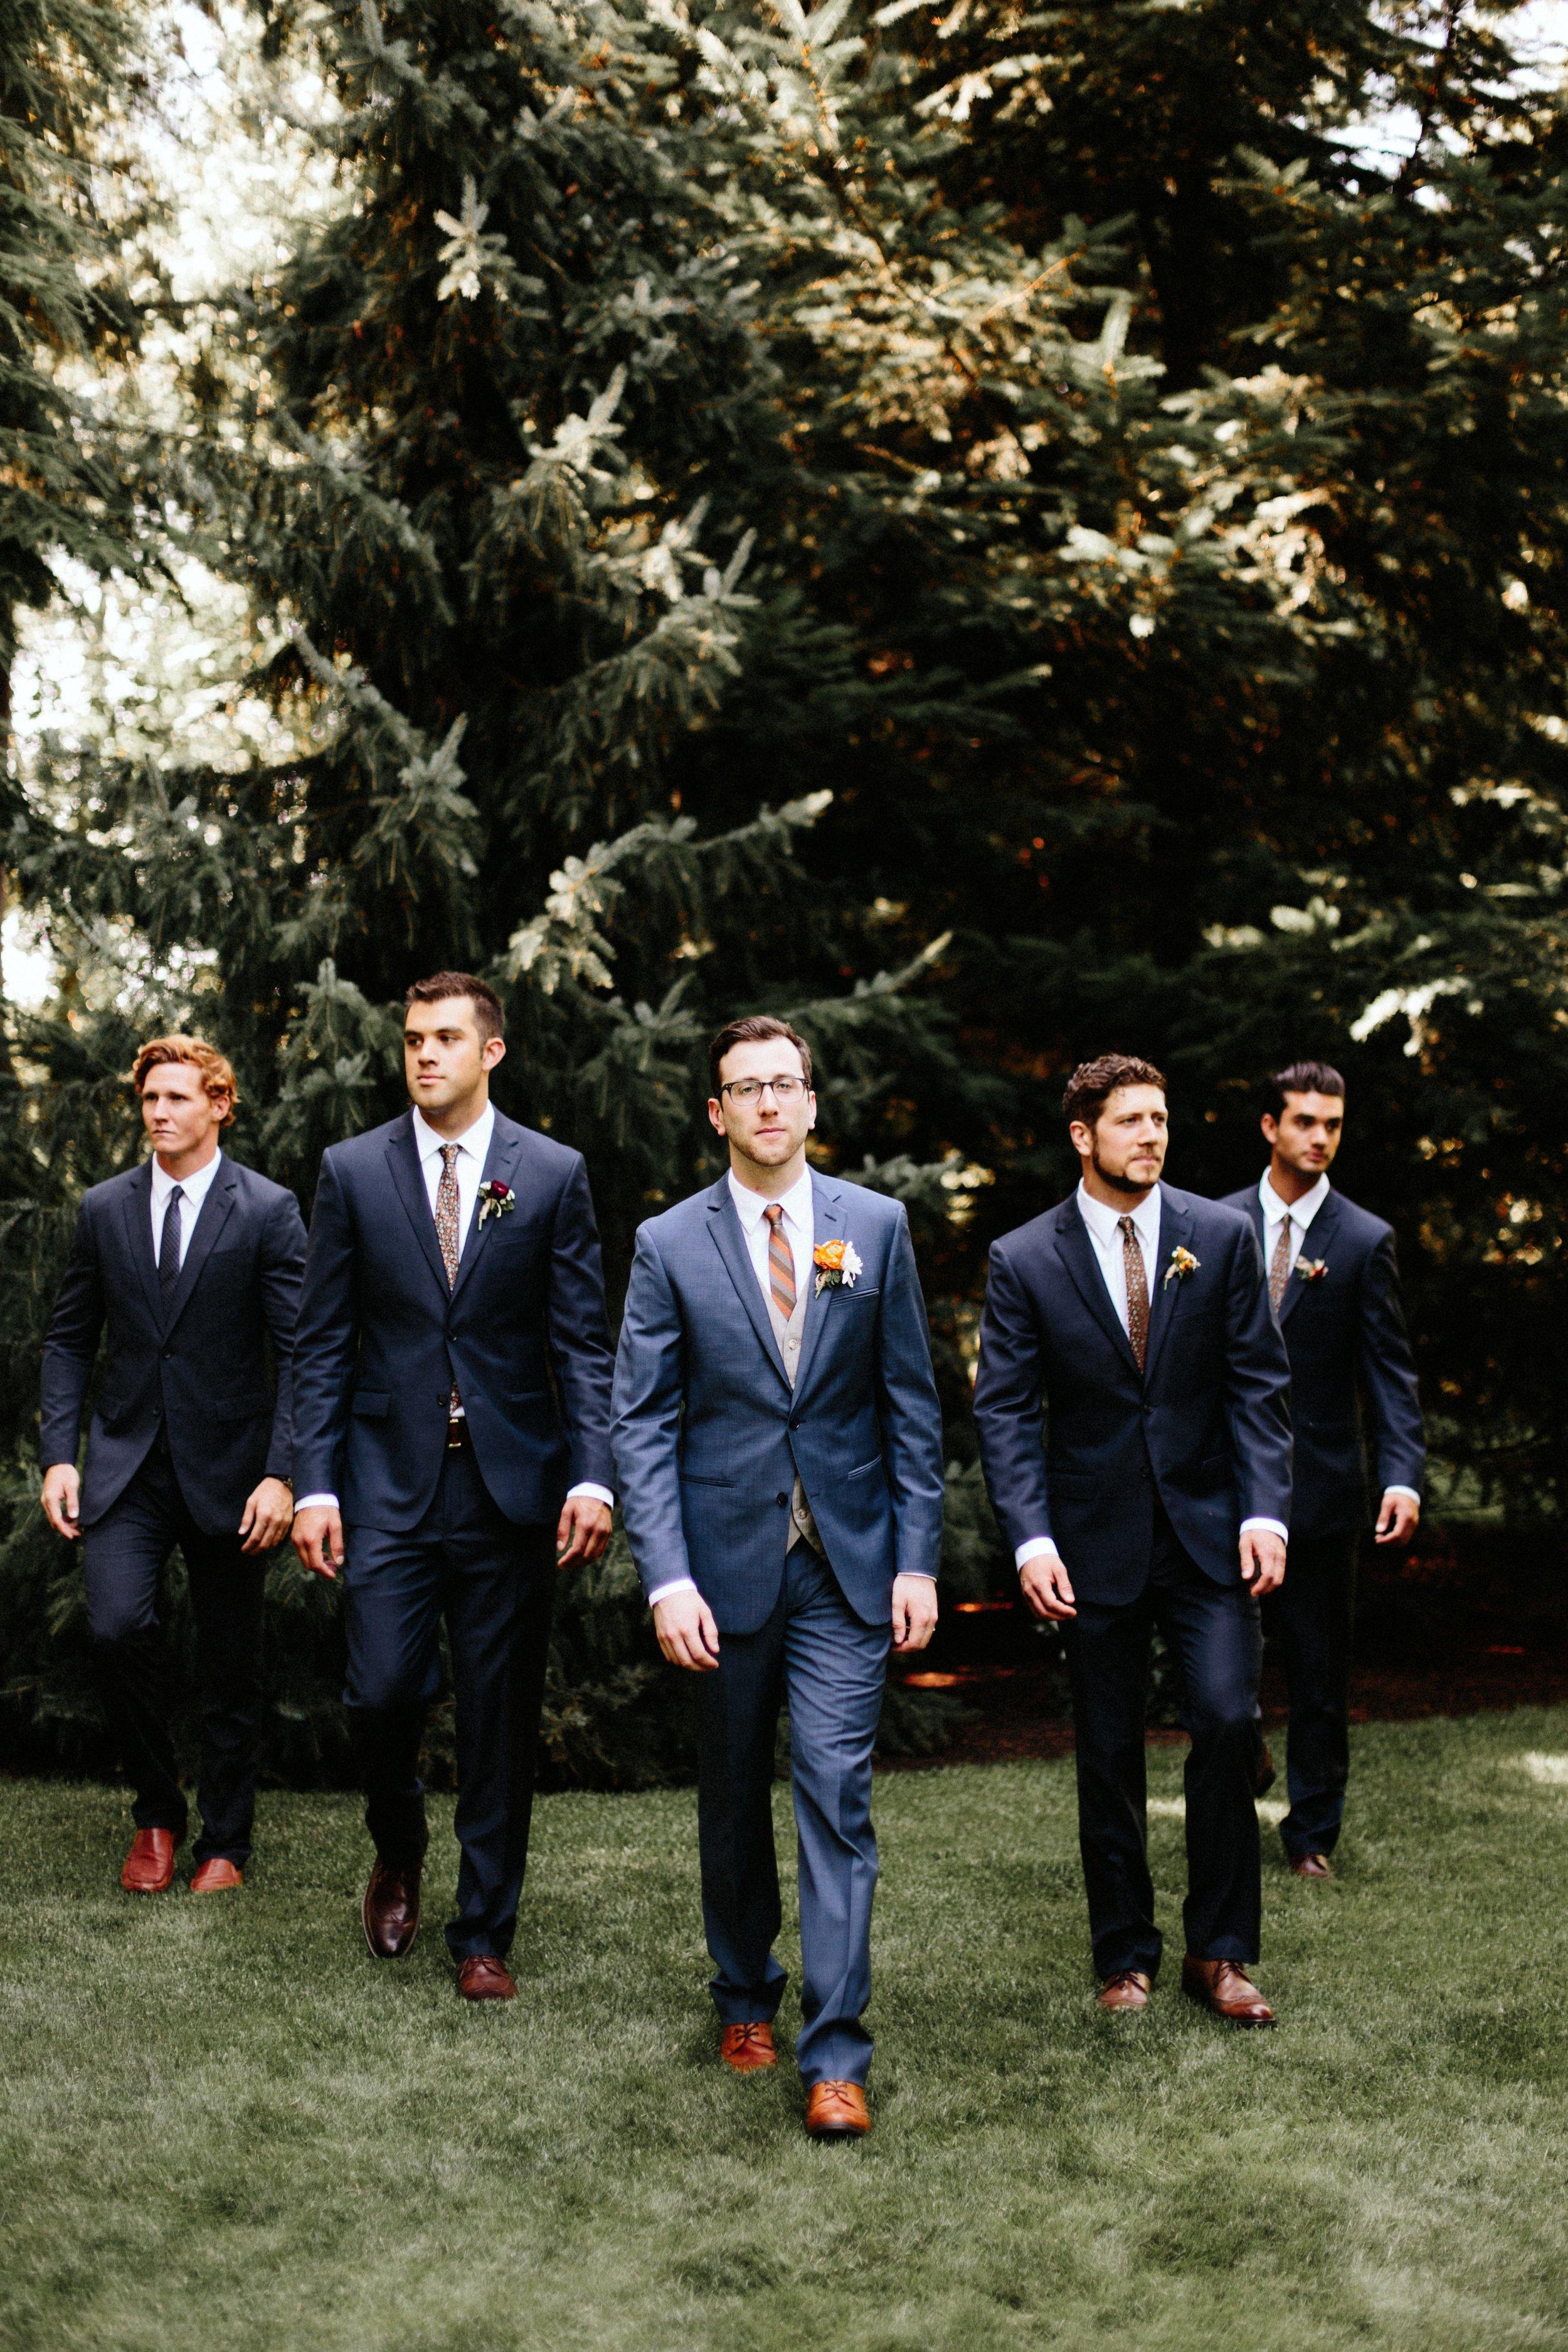 washington-wedding-19.jpg